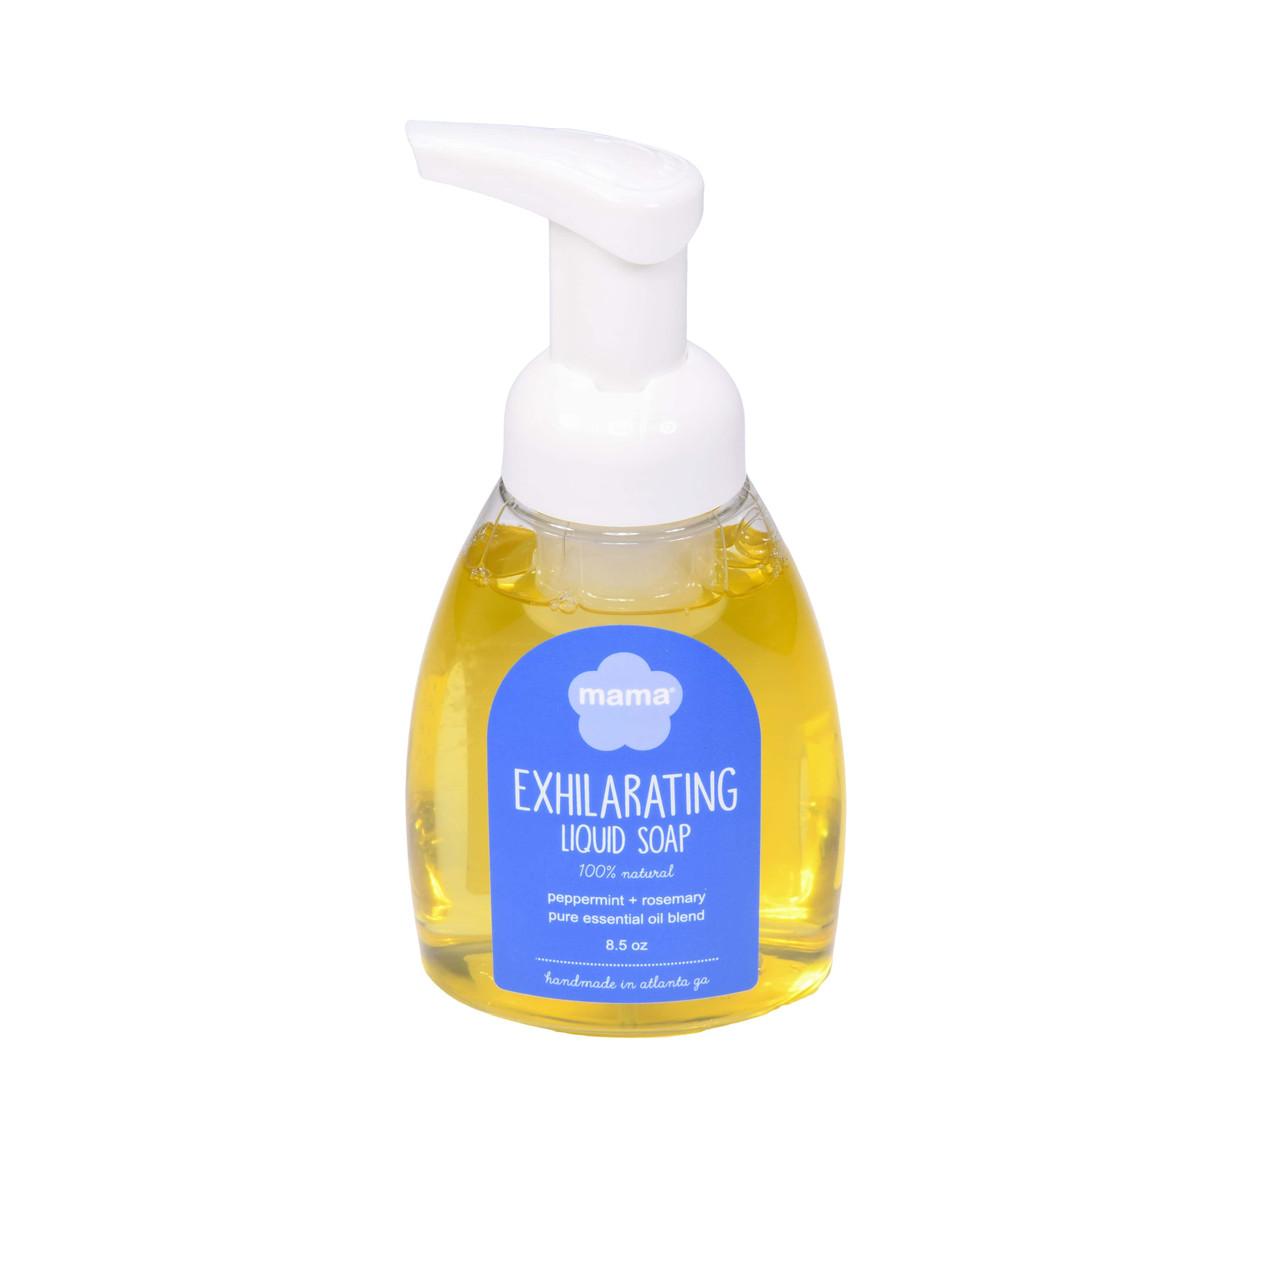 Exhilarating (Peppermint + Rosemary) Liquid Soap   Mama Bath + Body